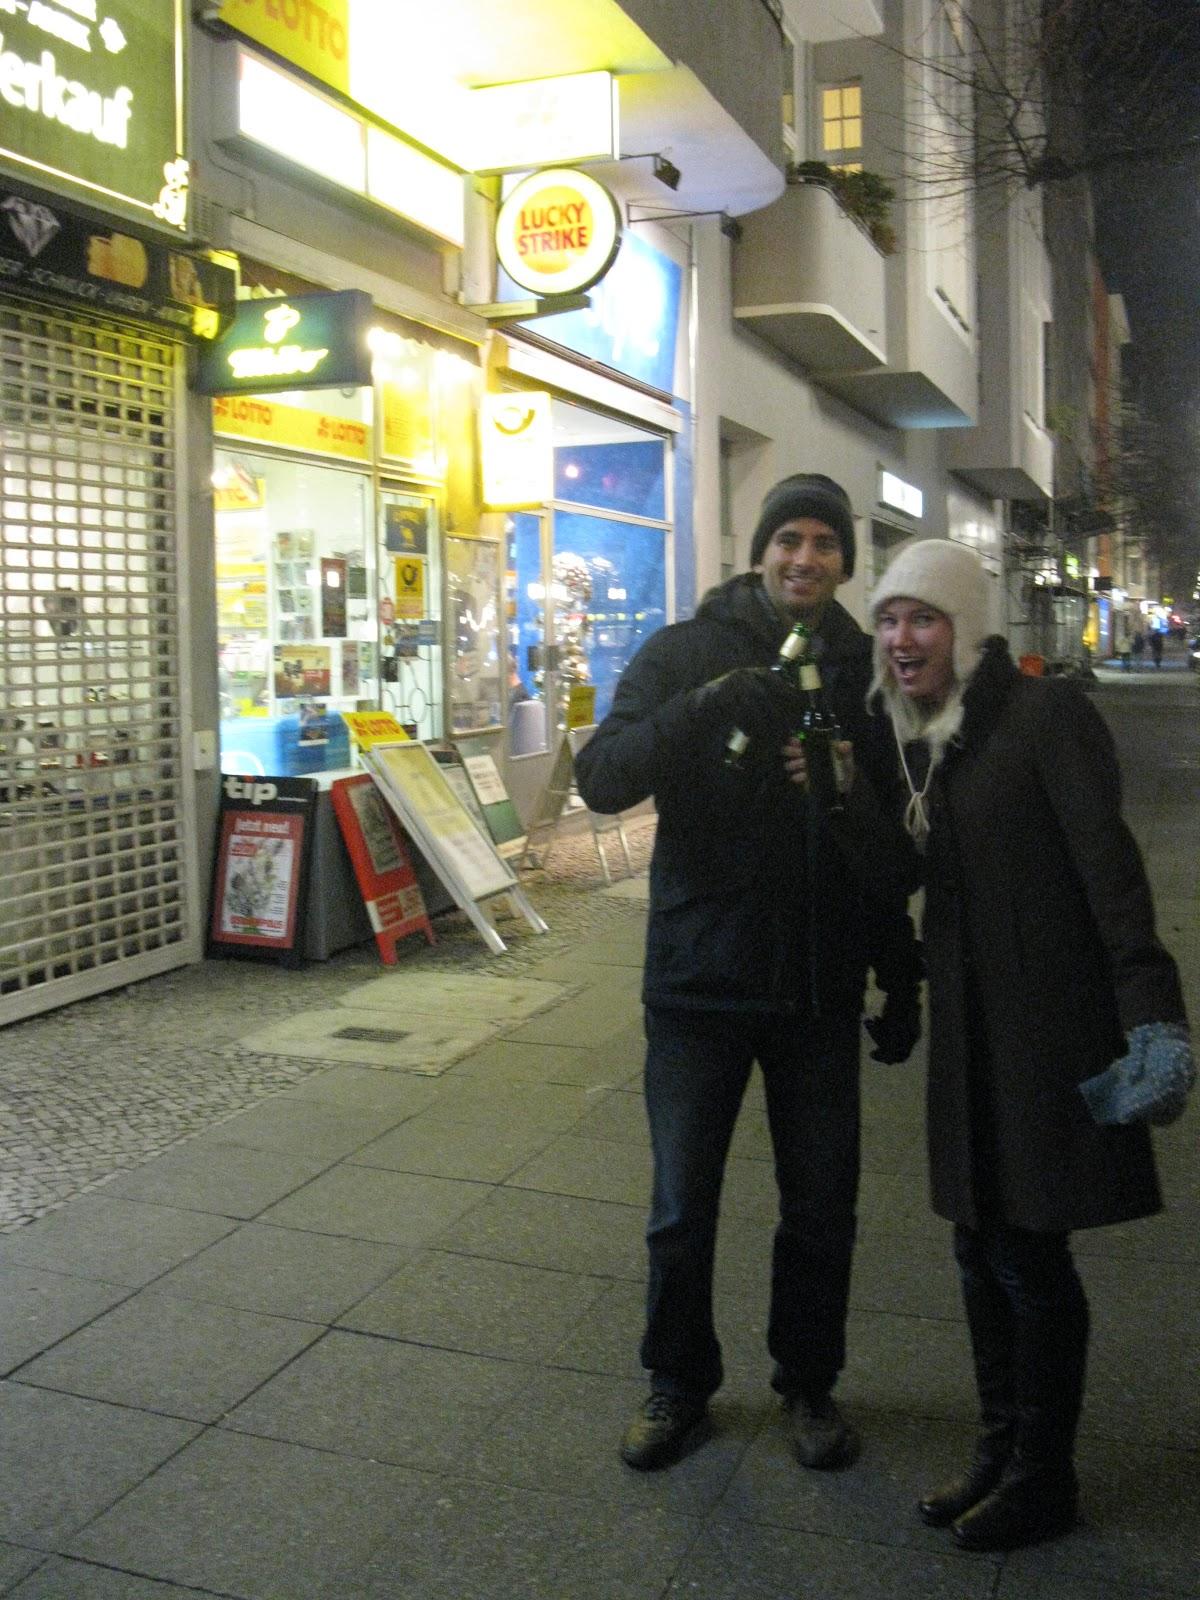 Thedeutschlanddiaries.blogspot.com